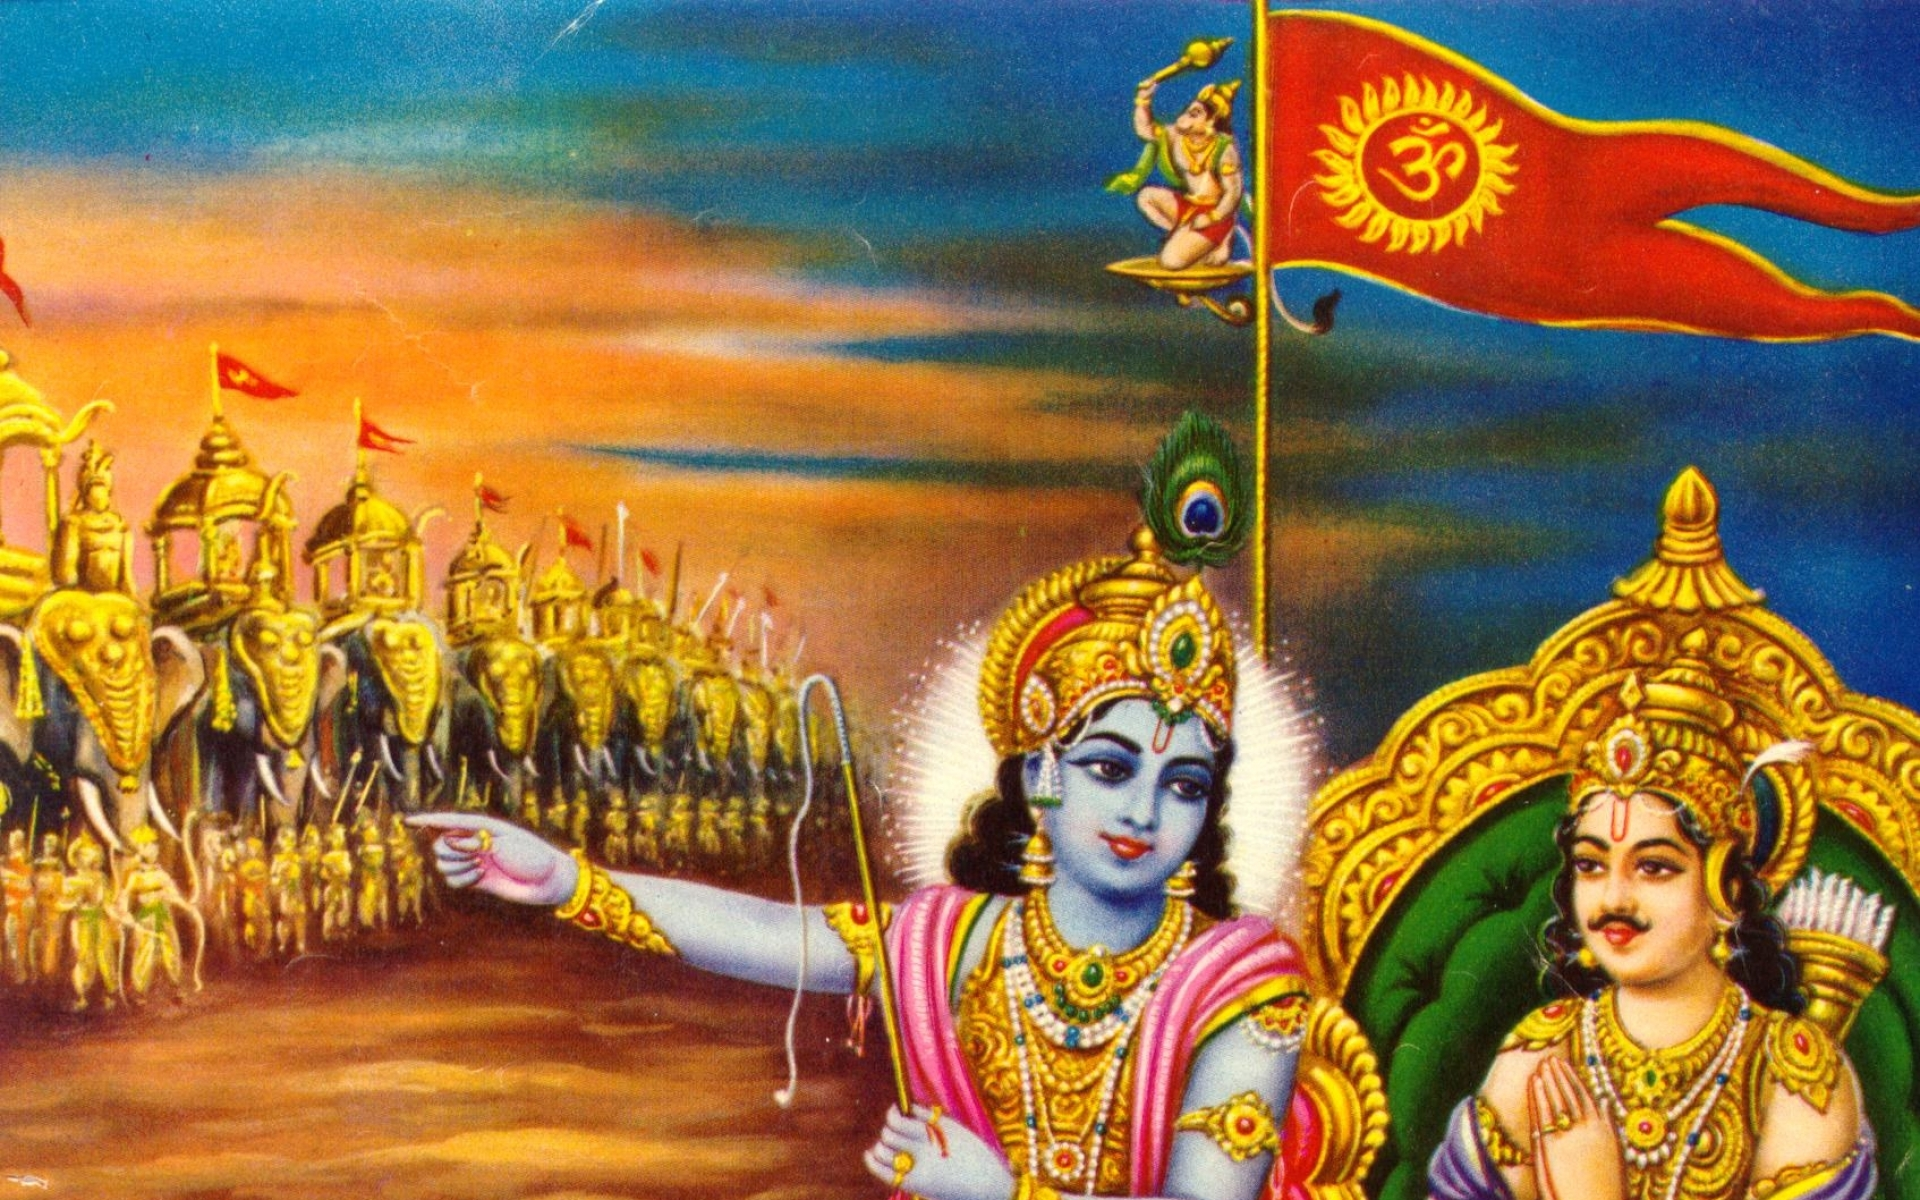 Hinduism Mythology Bhagavad Gita Wallpaper with 1920x1200 Resolution 1920x1200